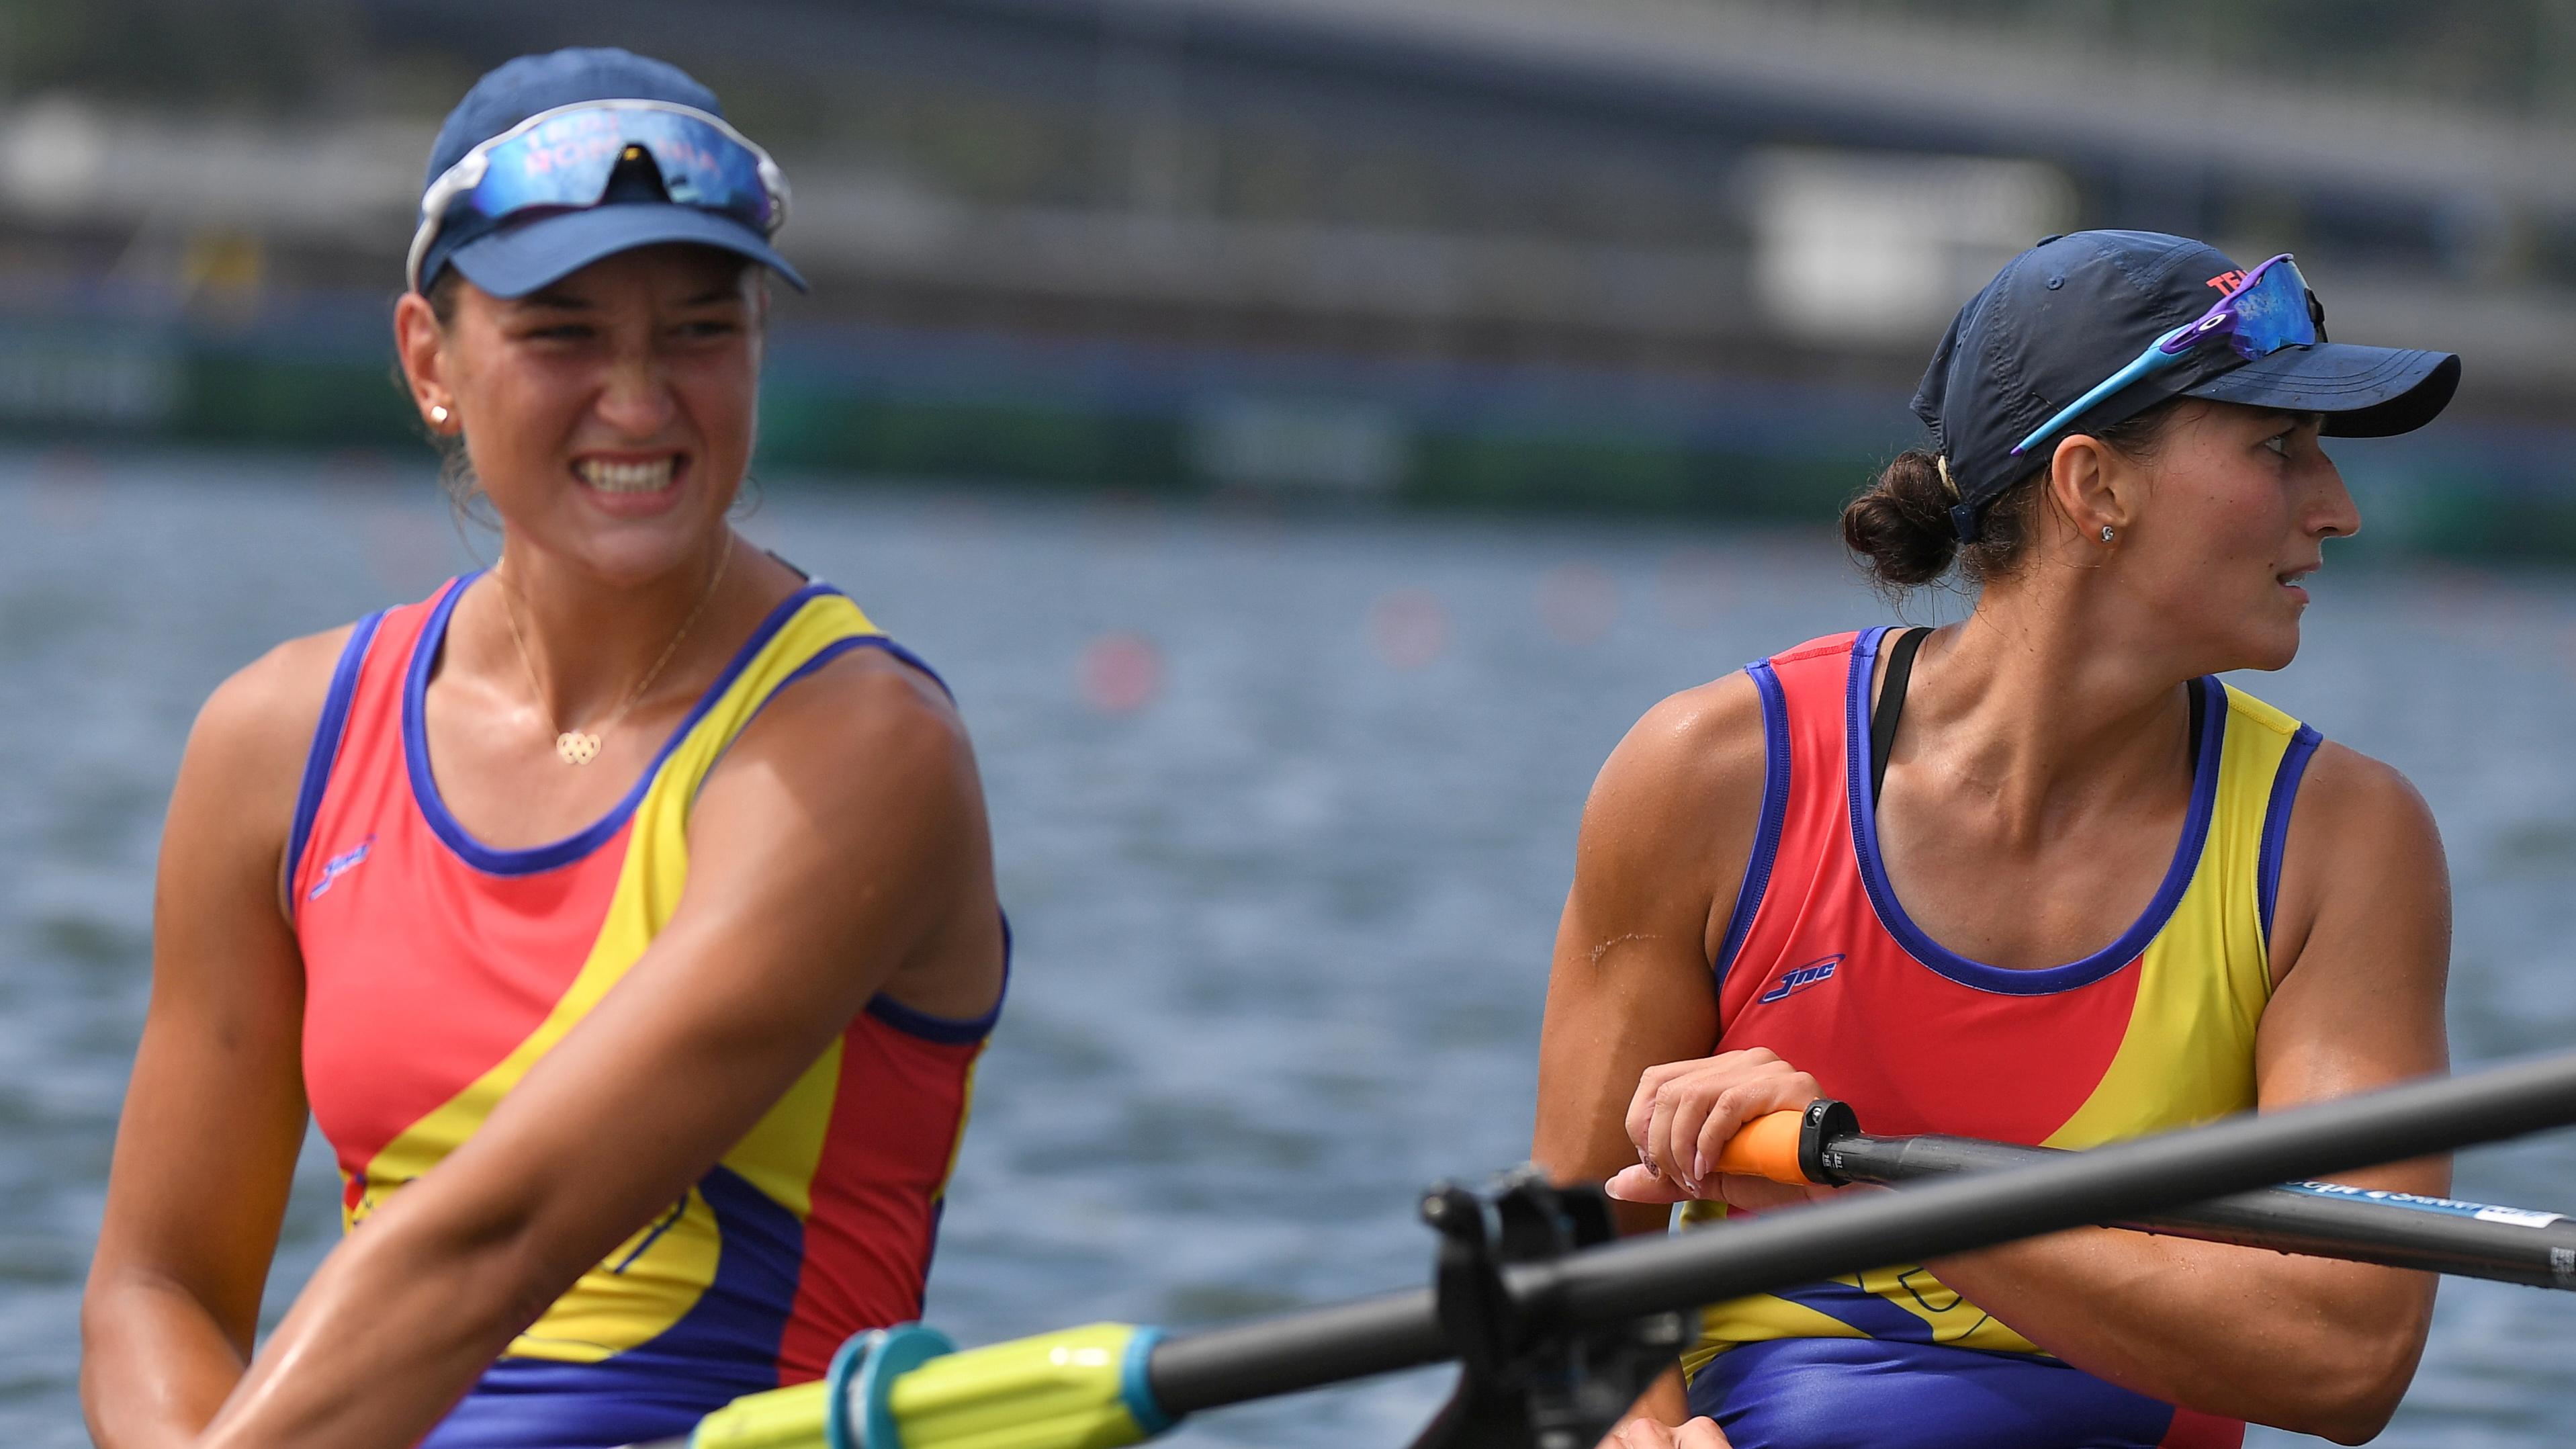 Tokyo 2020 Olympics - Rowing - Women's Double Sculls - Final A - Sea Forest Waterway, Tokyo, Japan - July 28, 2021. Ancuta Bodnar of Romania and Simona-Geanina Radis of Romania react after winning gold REUTERS/Piroschka Van De Wouw